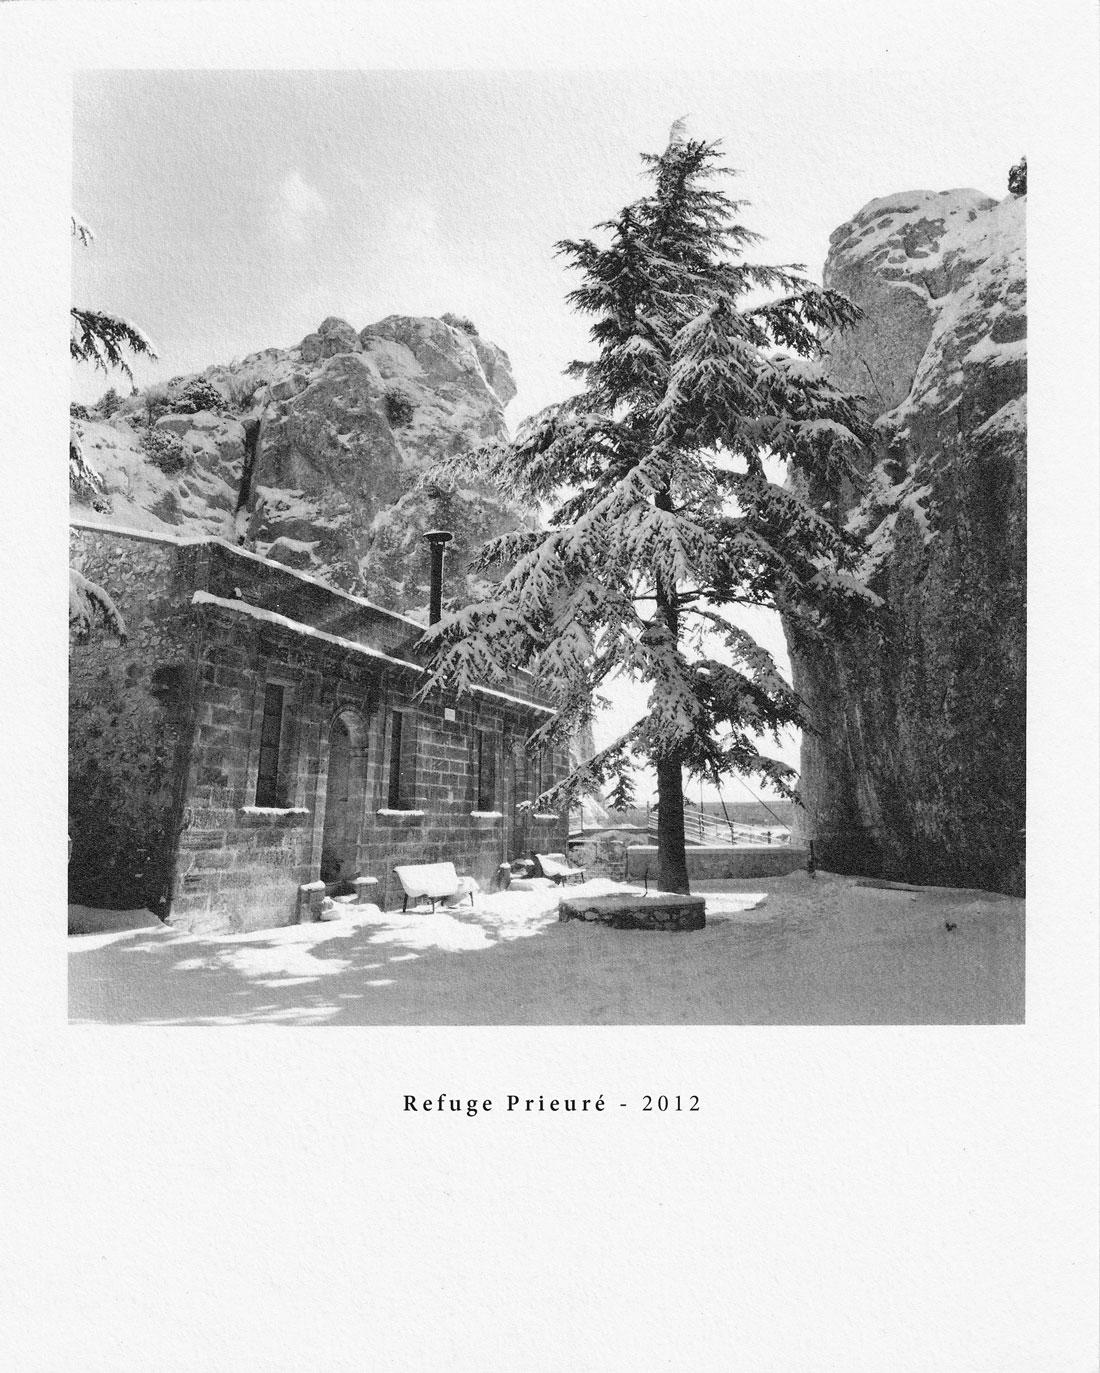 19-Refuge-Prieuré-2